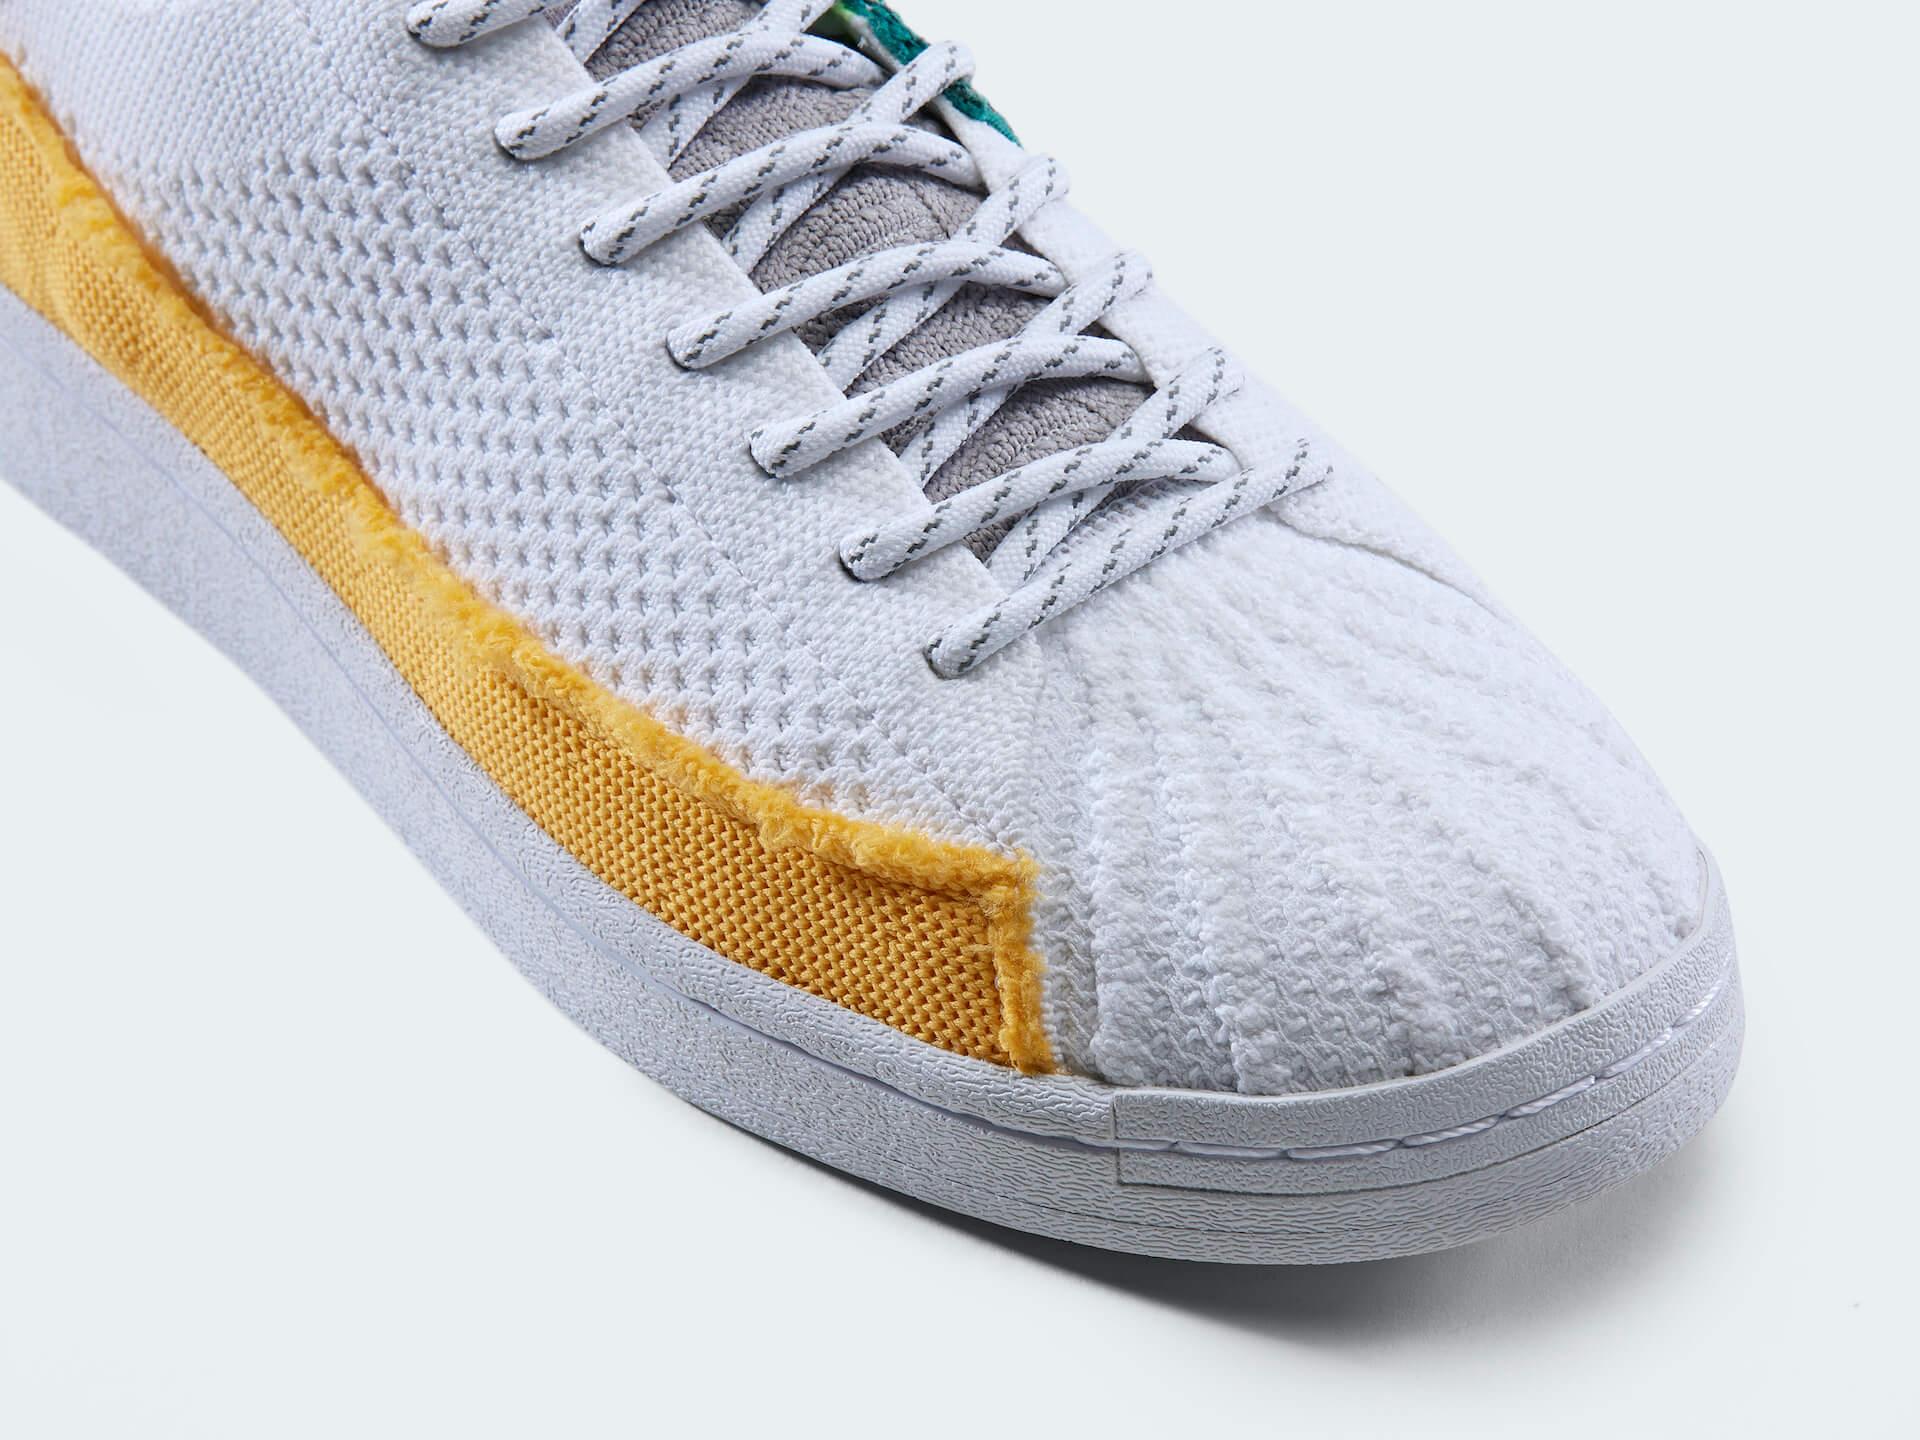 adidas Originalsとファレル・ウィリアムスのコラボ『SUPERSTAR』が登場!パッチワークパネルが目を引くデザイン lf200701_adidasporiginals_pharrelwilliams_03